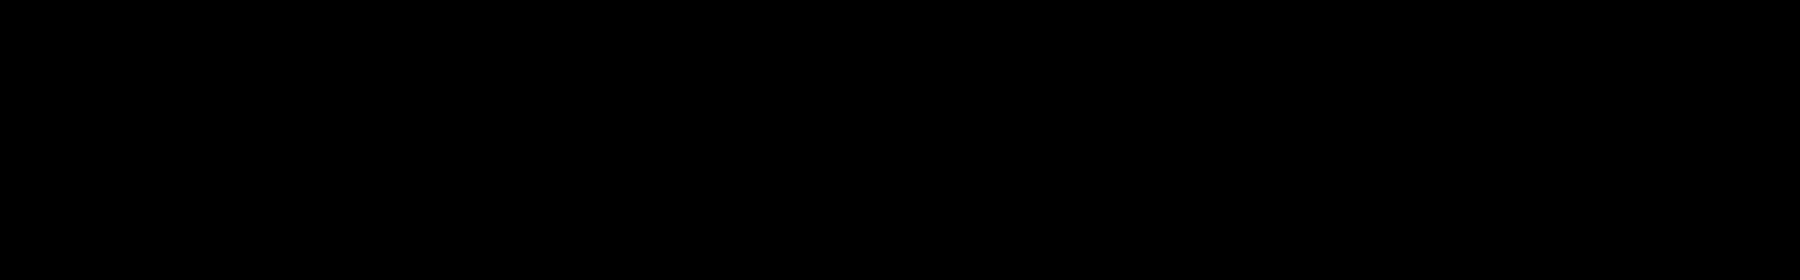 Calculate Vol.1 audio waveform